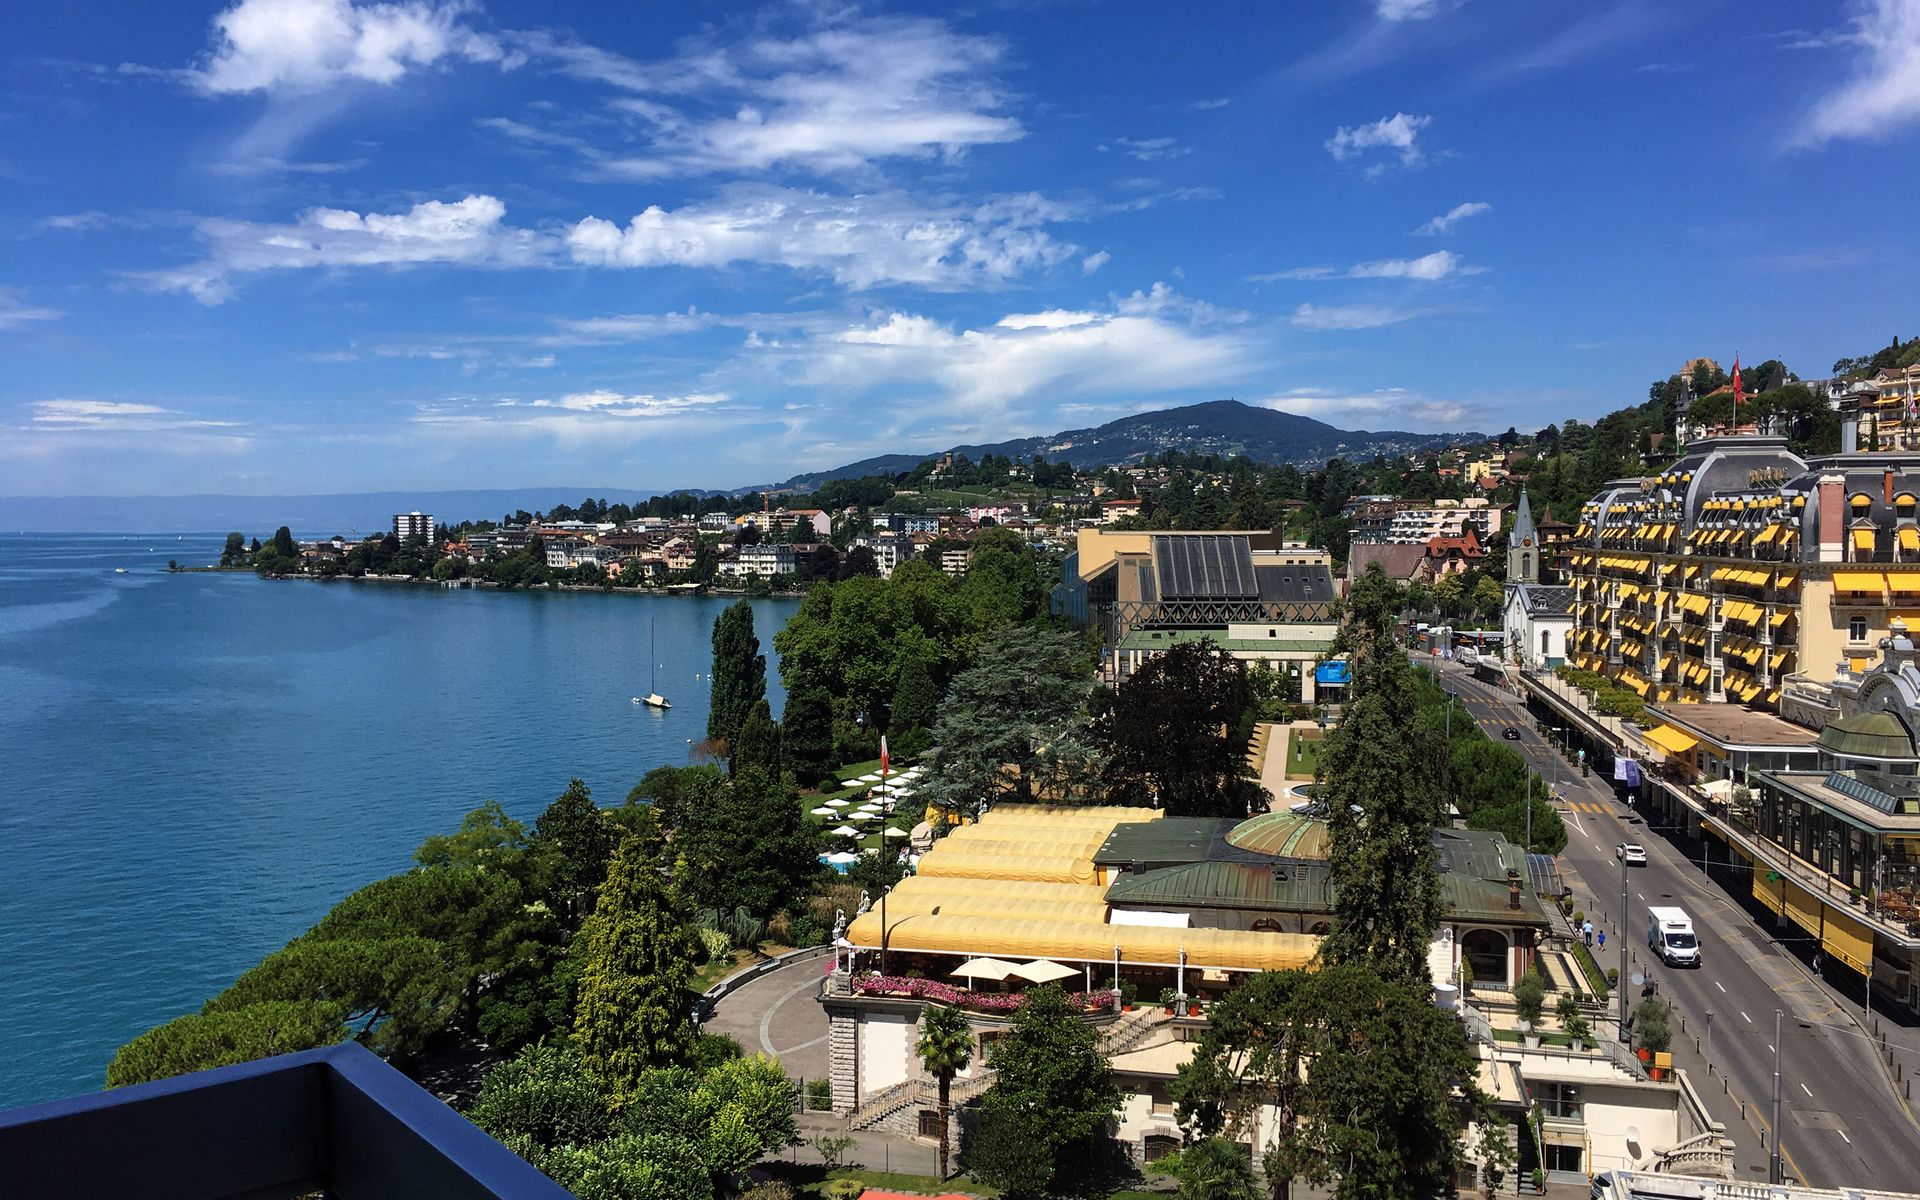 швейцария, дома, побережье, montreux, улица, город